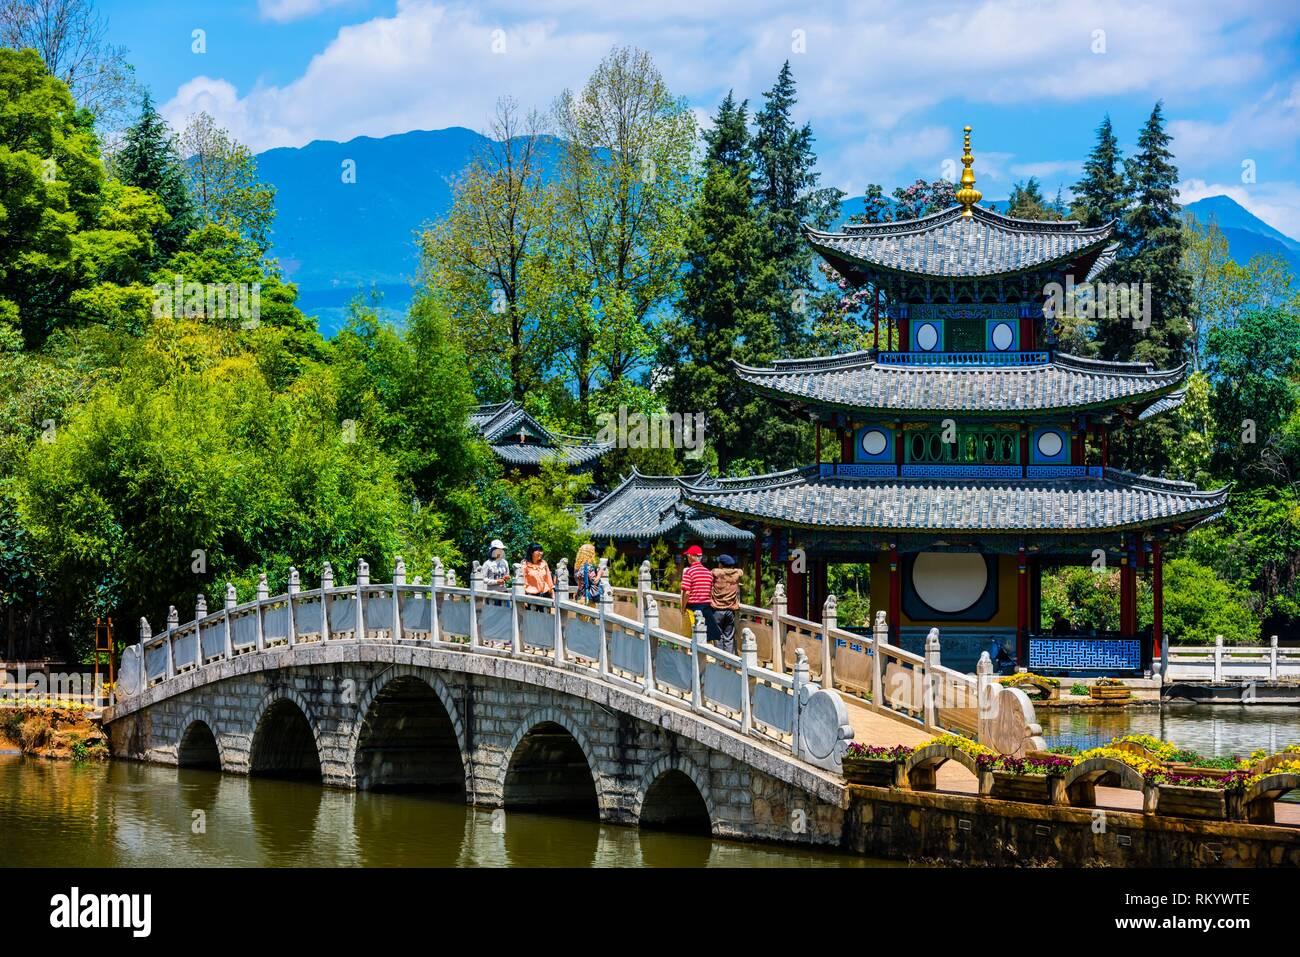 Suochi Bridge and Deyue Pavilion, Black Dragon Pool Park, Lijiang, Yunnan Province, China. - Stock Image